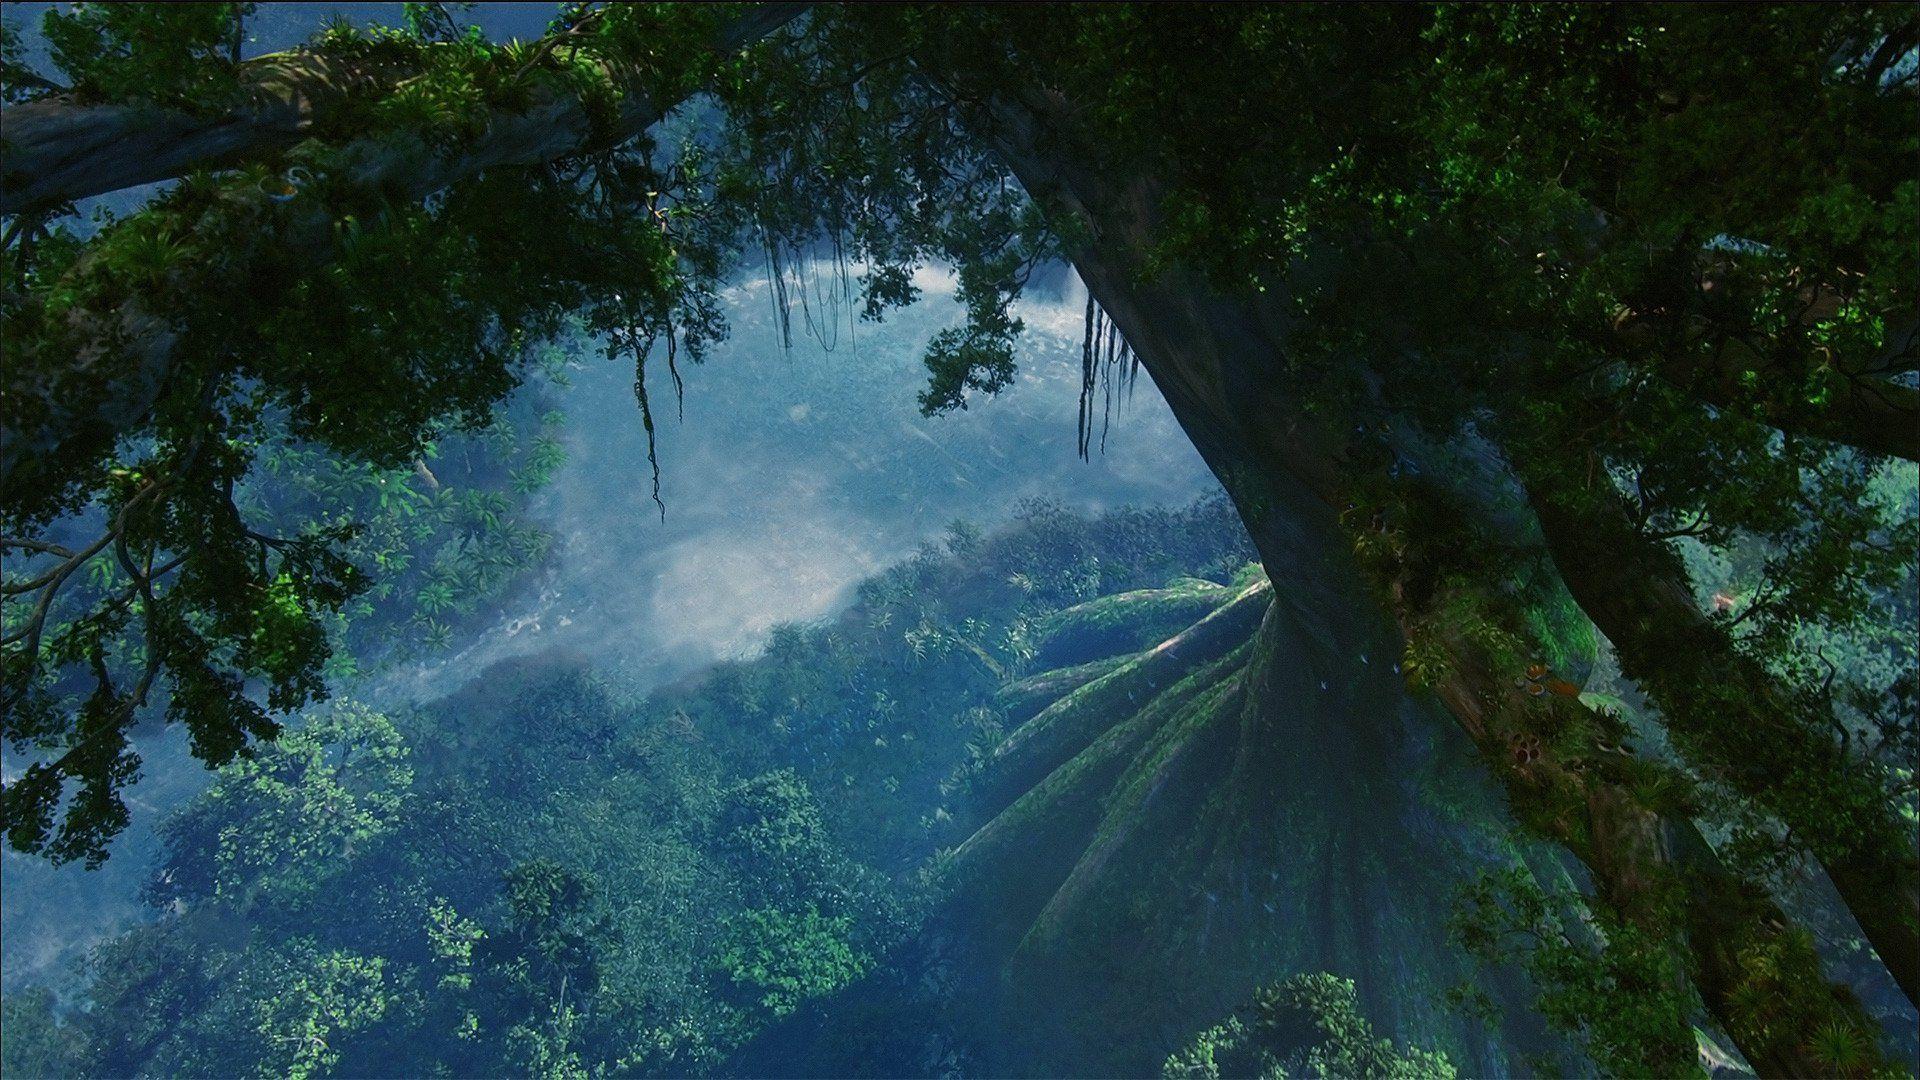 California Avatar Movie Landscape Wallpaper Background Images